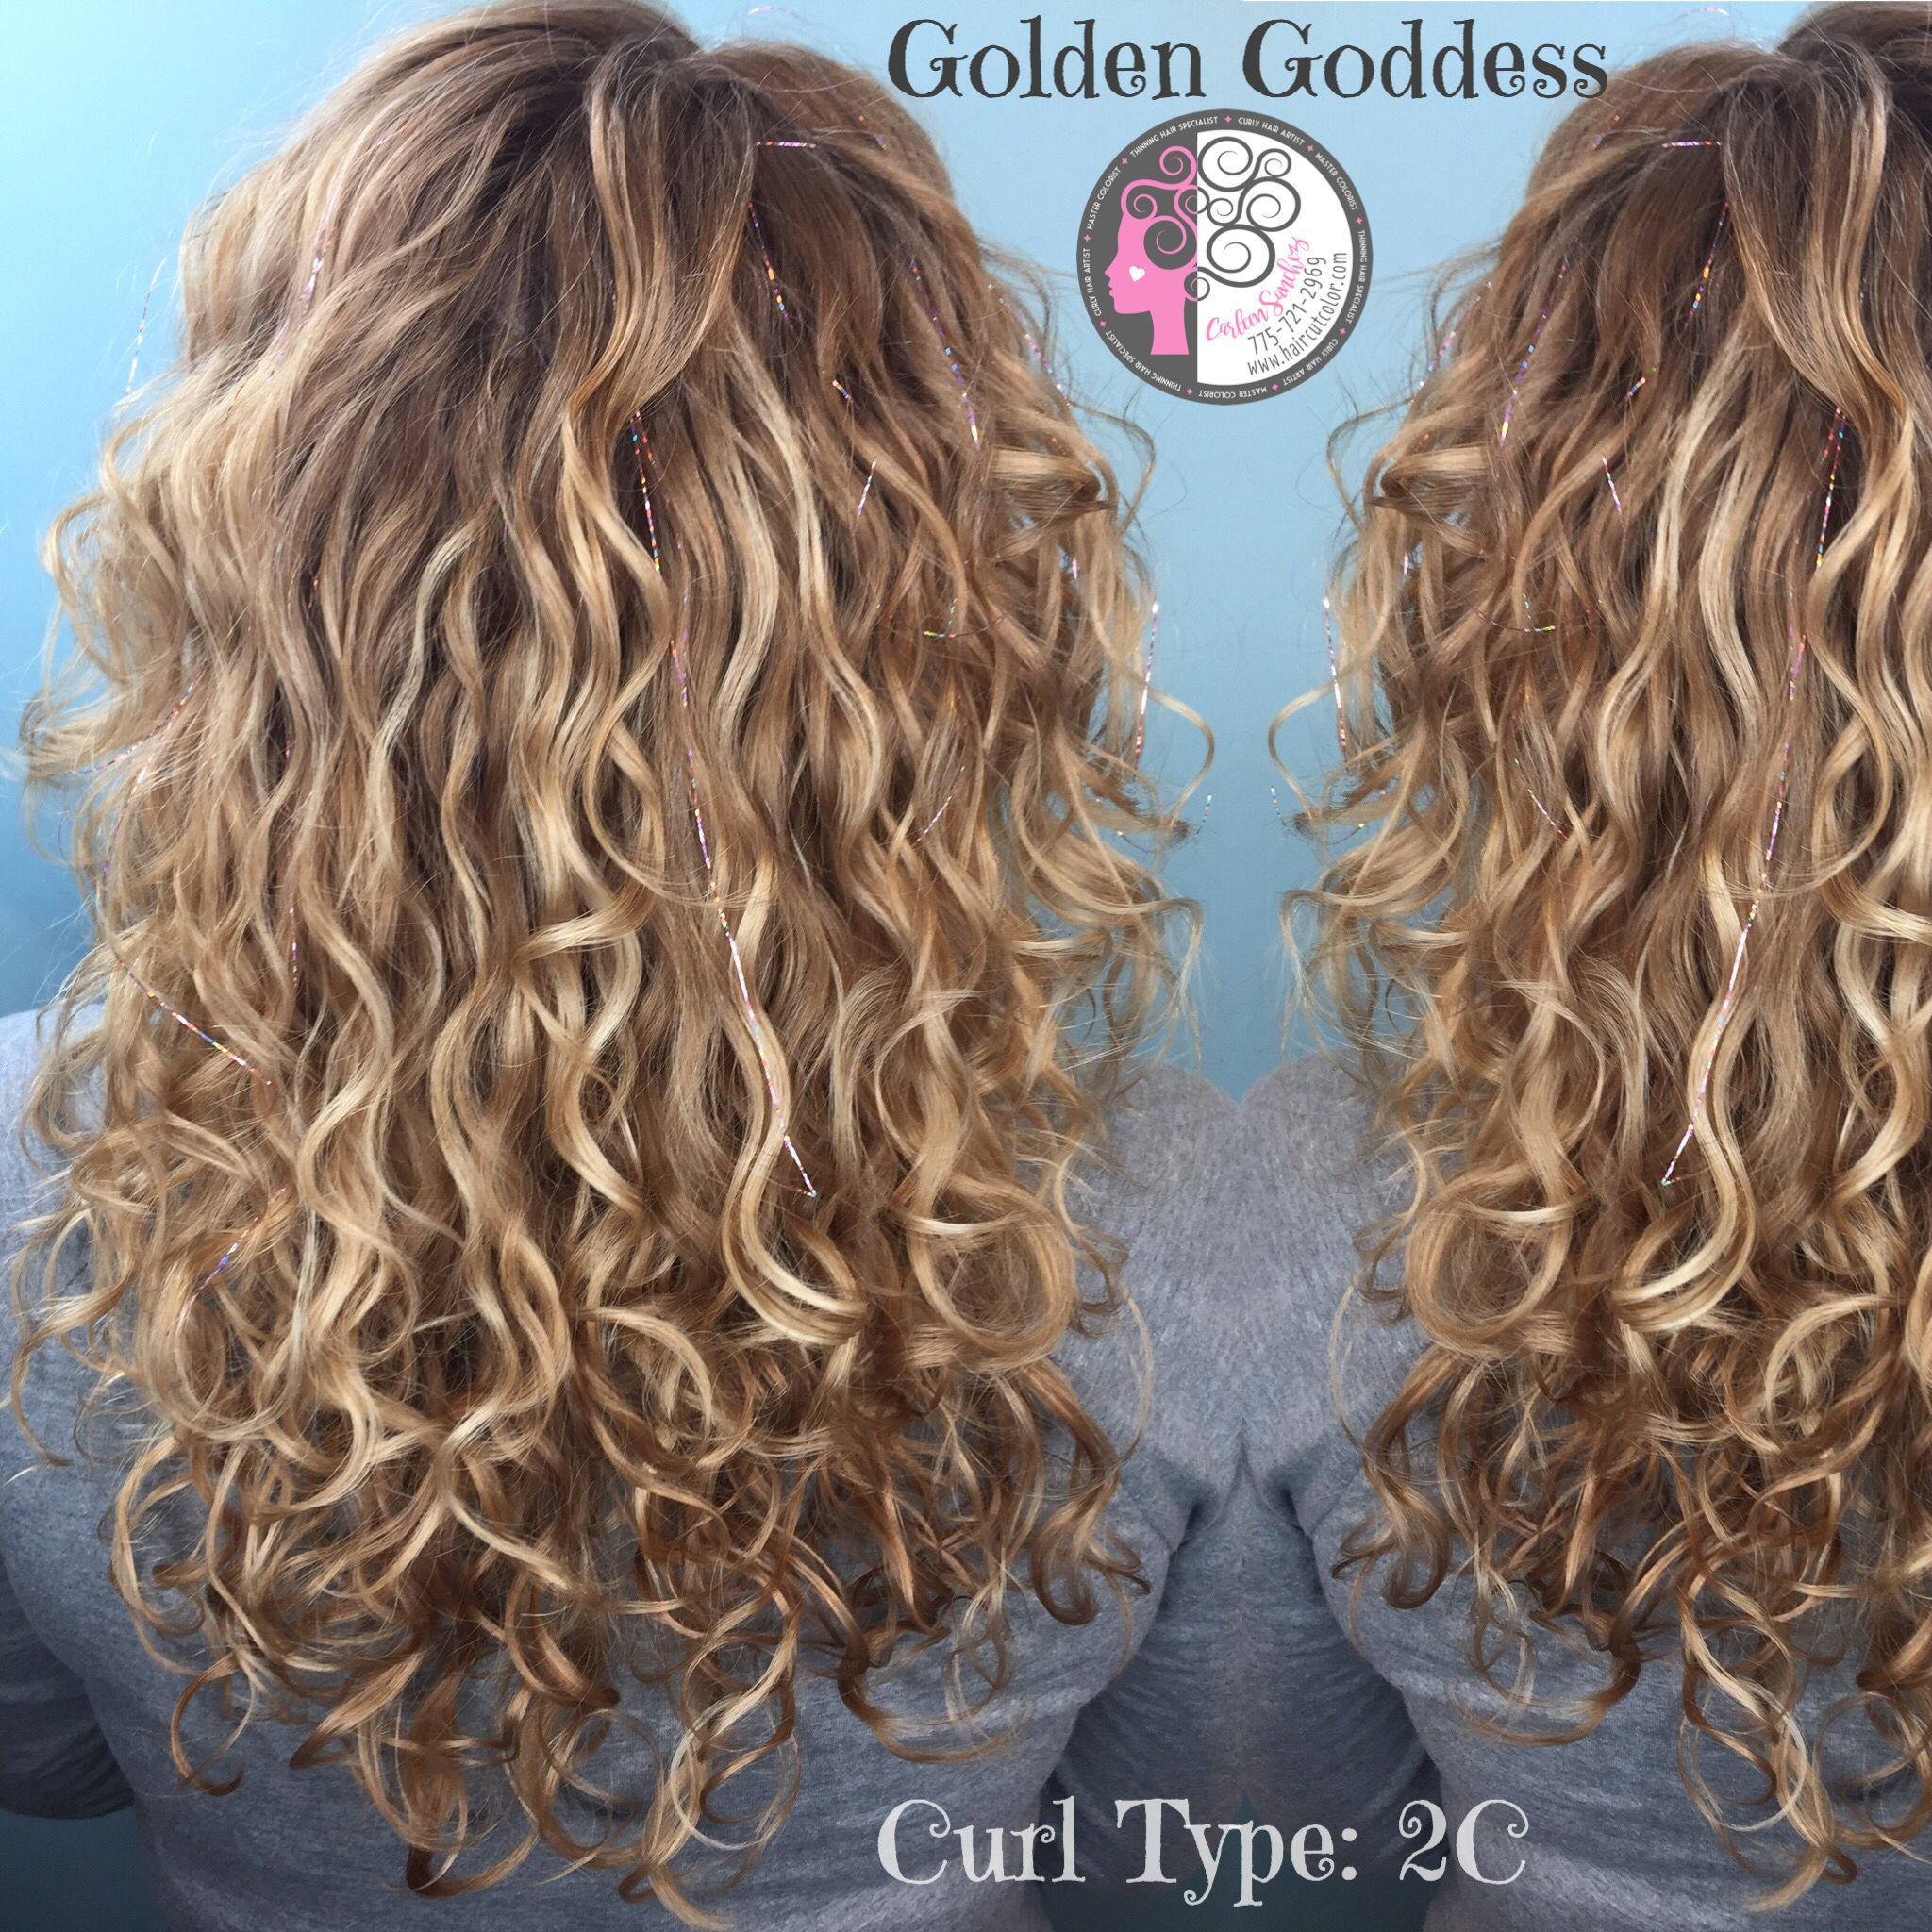 Naturally Curly Balayage Highlights Blond Hair By Carleen Sanchez Nevada S Curl Expert 7 Highlights Curly Hair Blonde Highlights Curly Hair Curly Balayage Hair